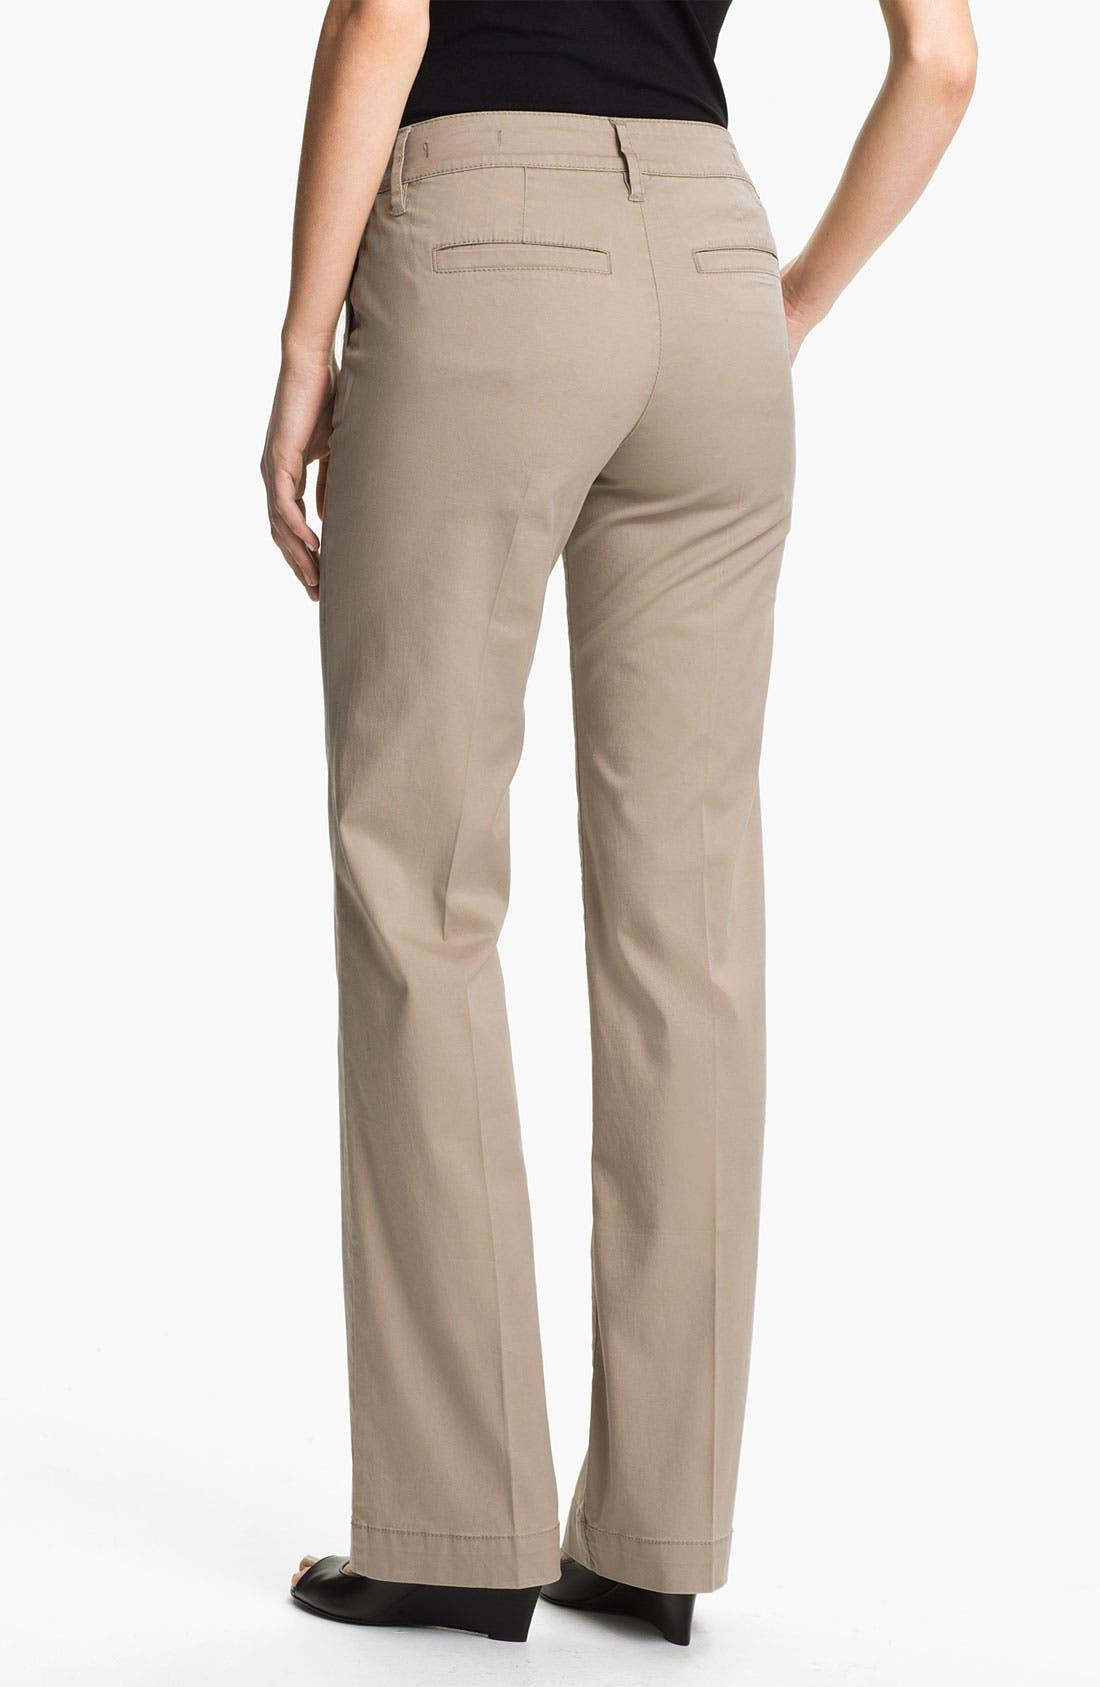 Alternate Image 2  - Jag Jeans 'Maitland' Trousers (Petite)